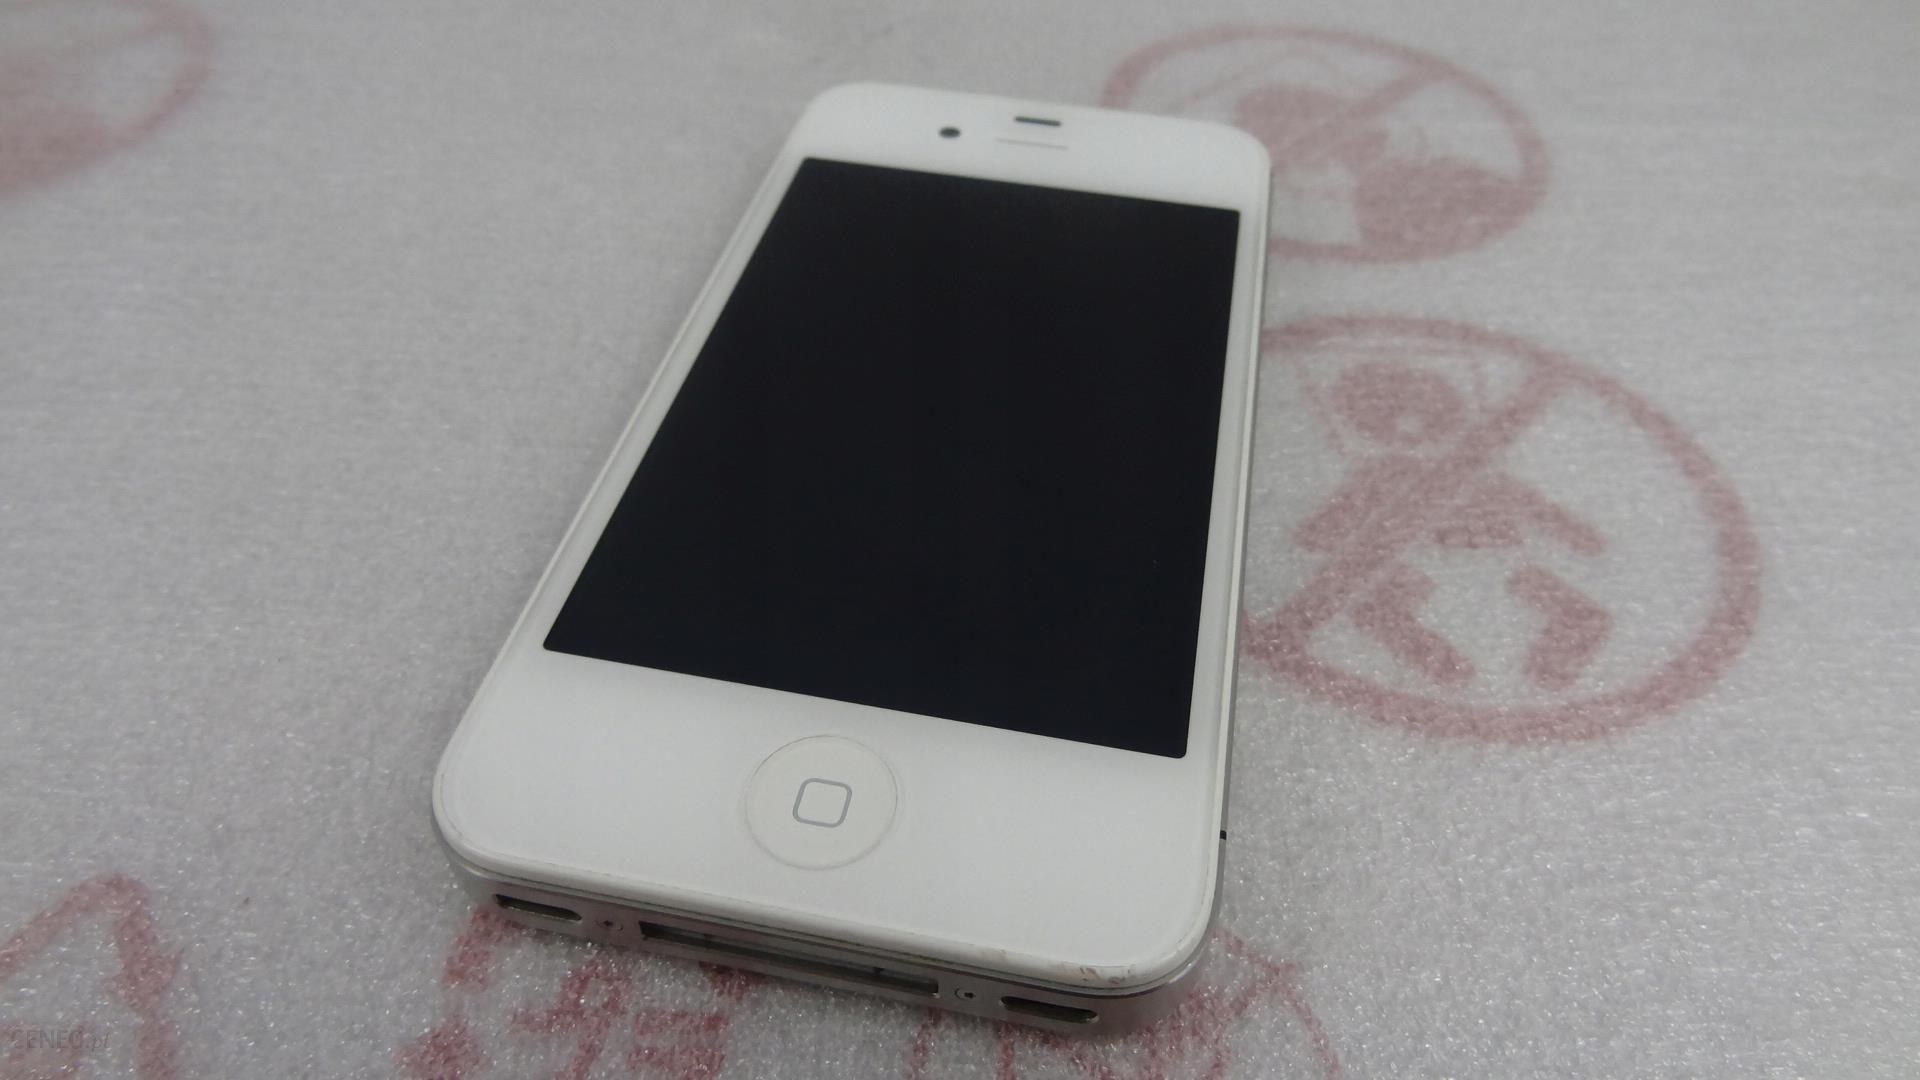 Telefony Z Outletu Produkt Z Outletu Iphone 4s A1387 16gb Icloud Faktura Ceny I Opinie Ceneo Pl